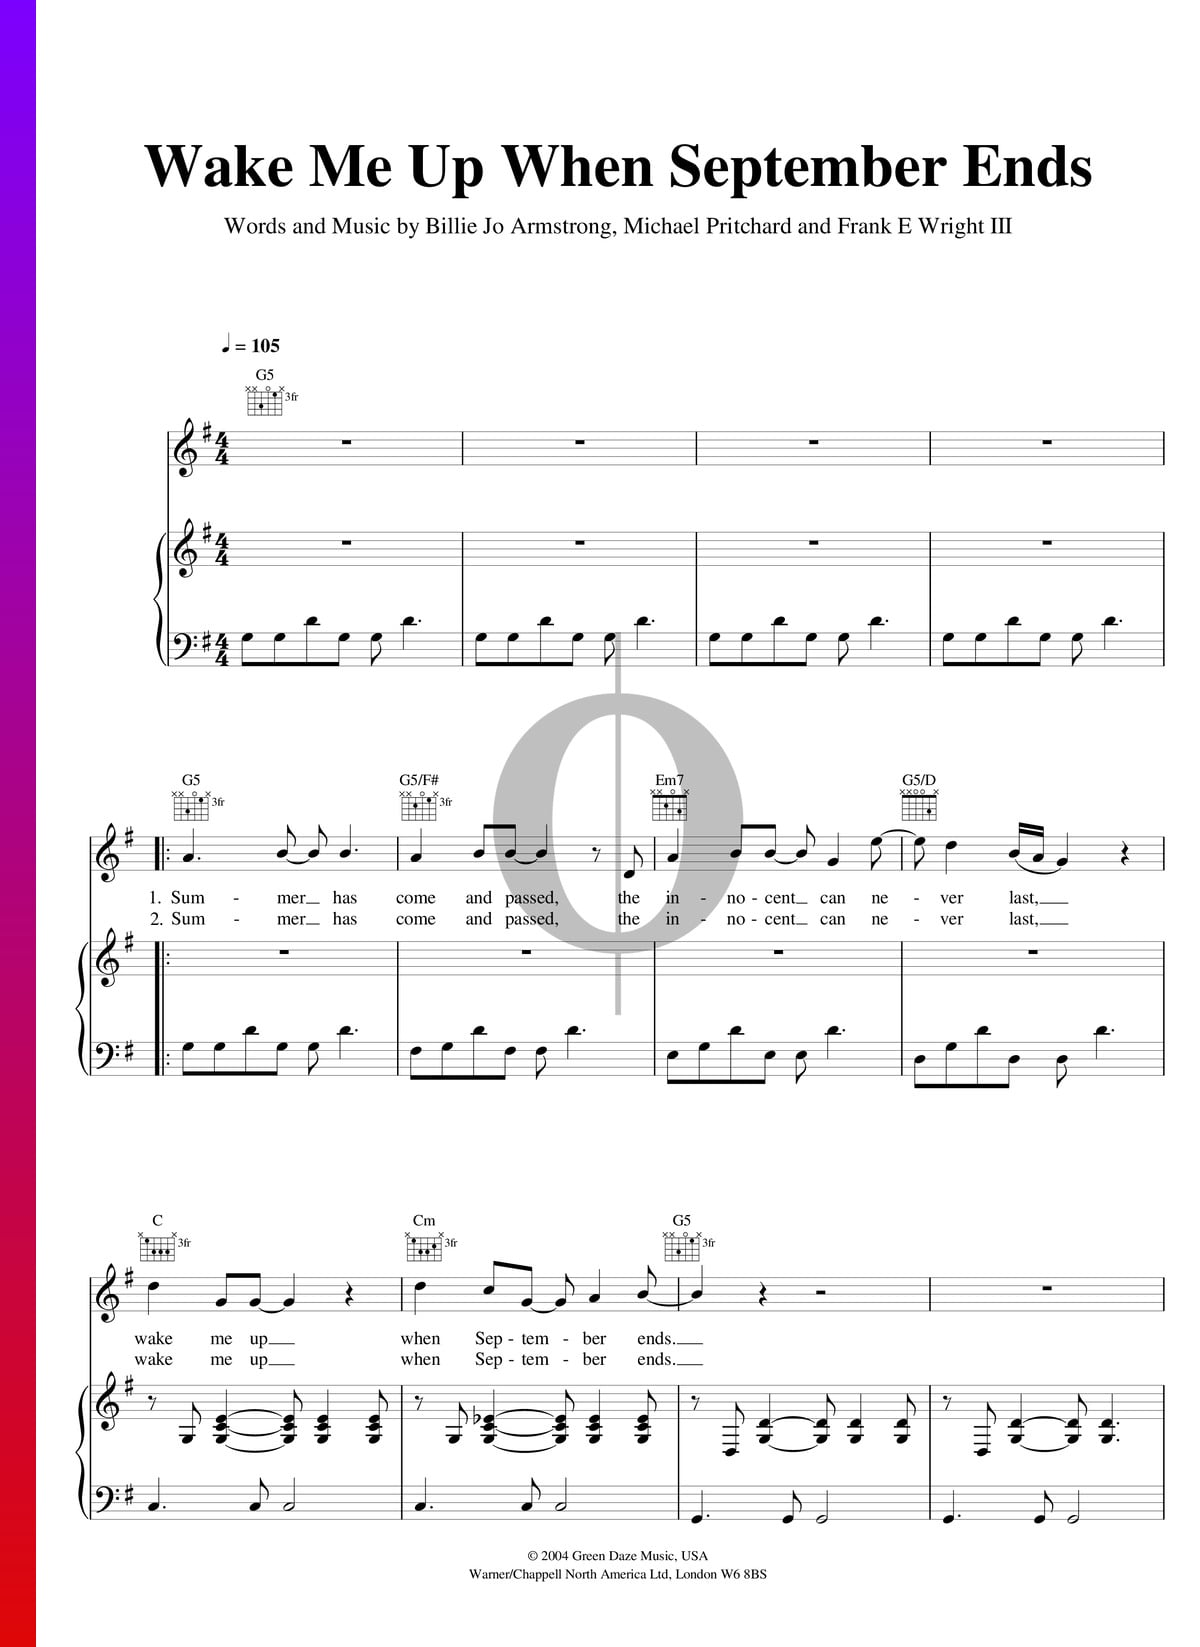 Wake Me Up When September Ends Sheet Music Piano Voice Guitar Pdf Download Streaming Oktav